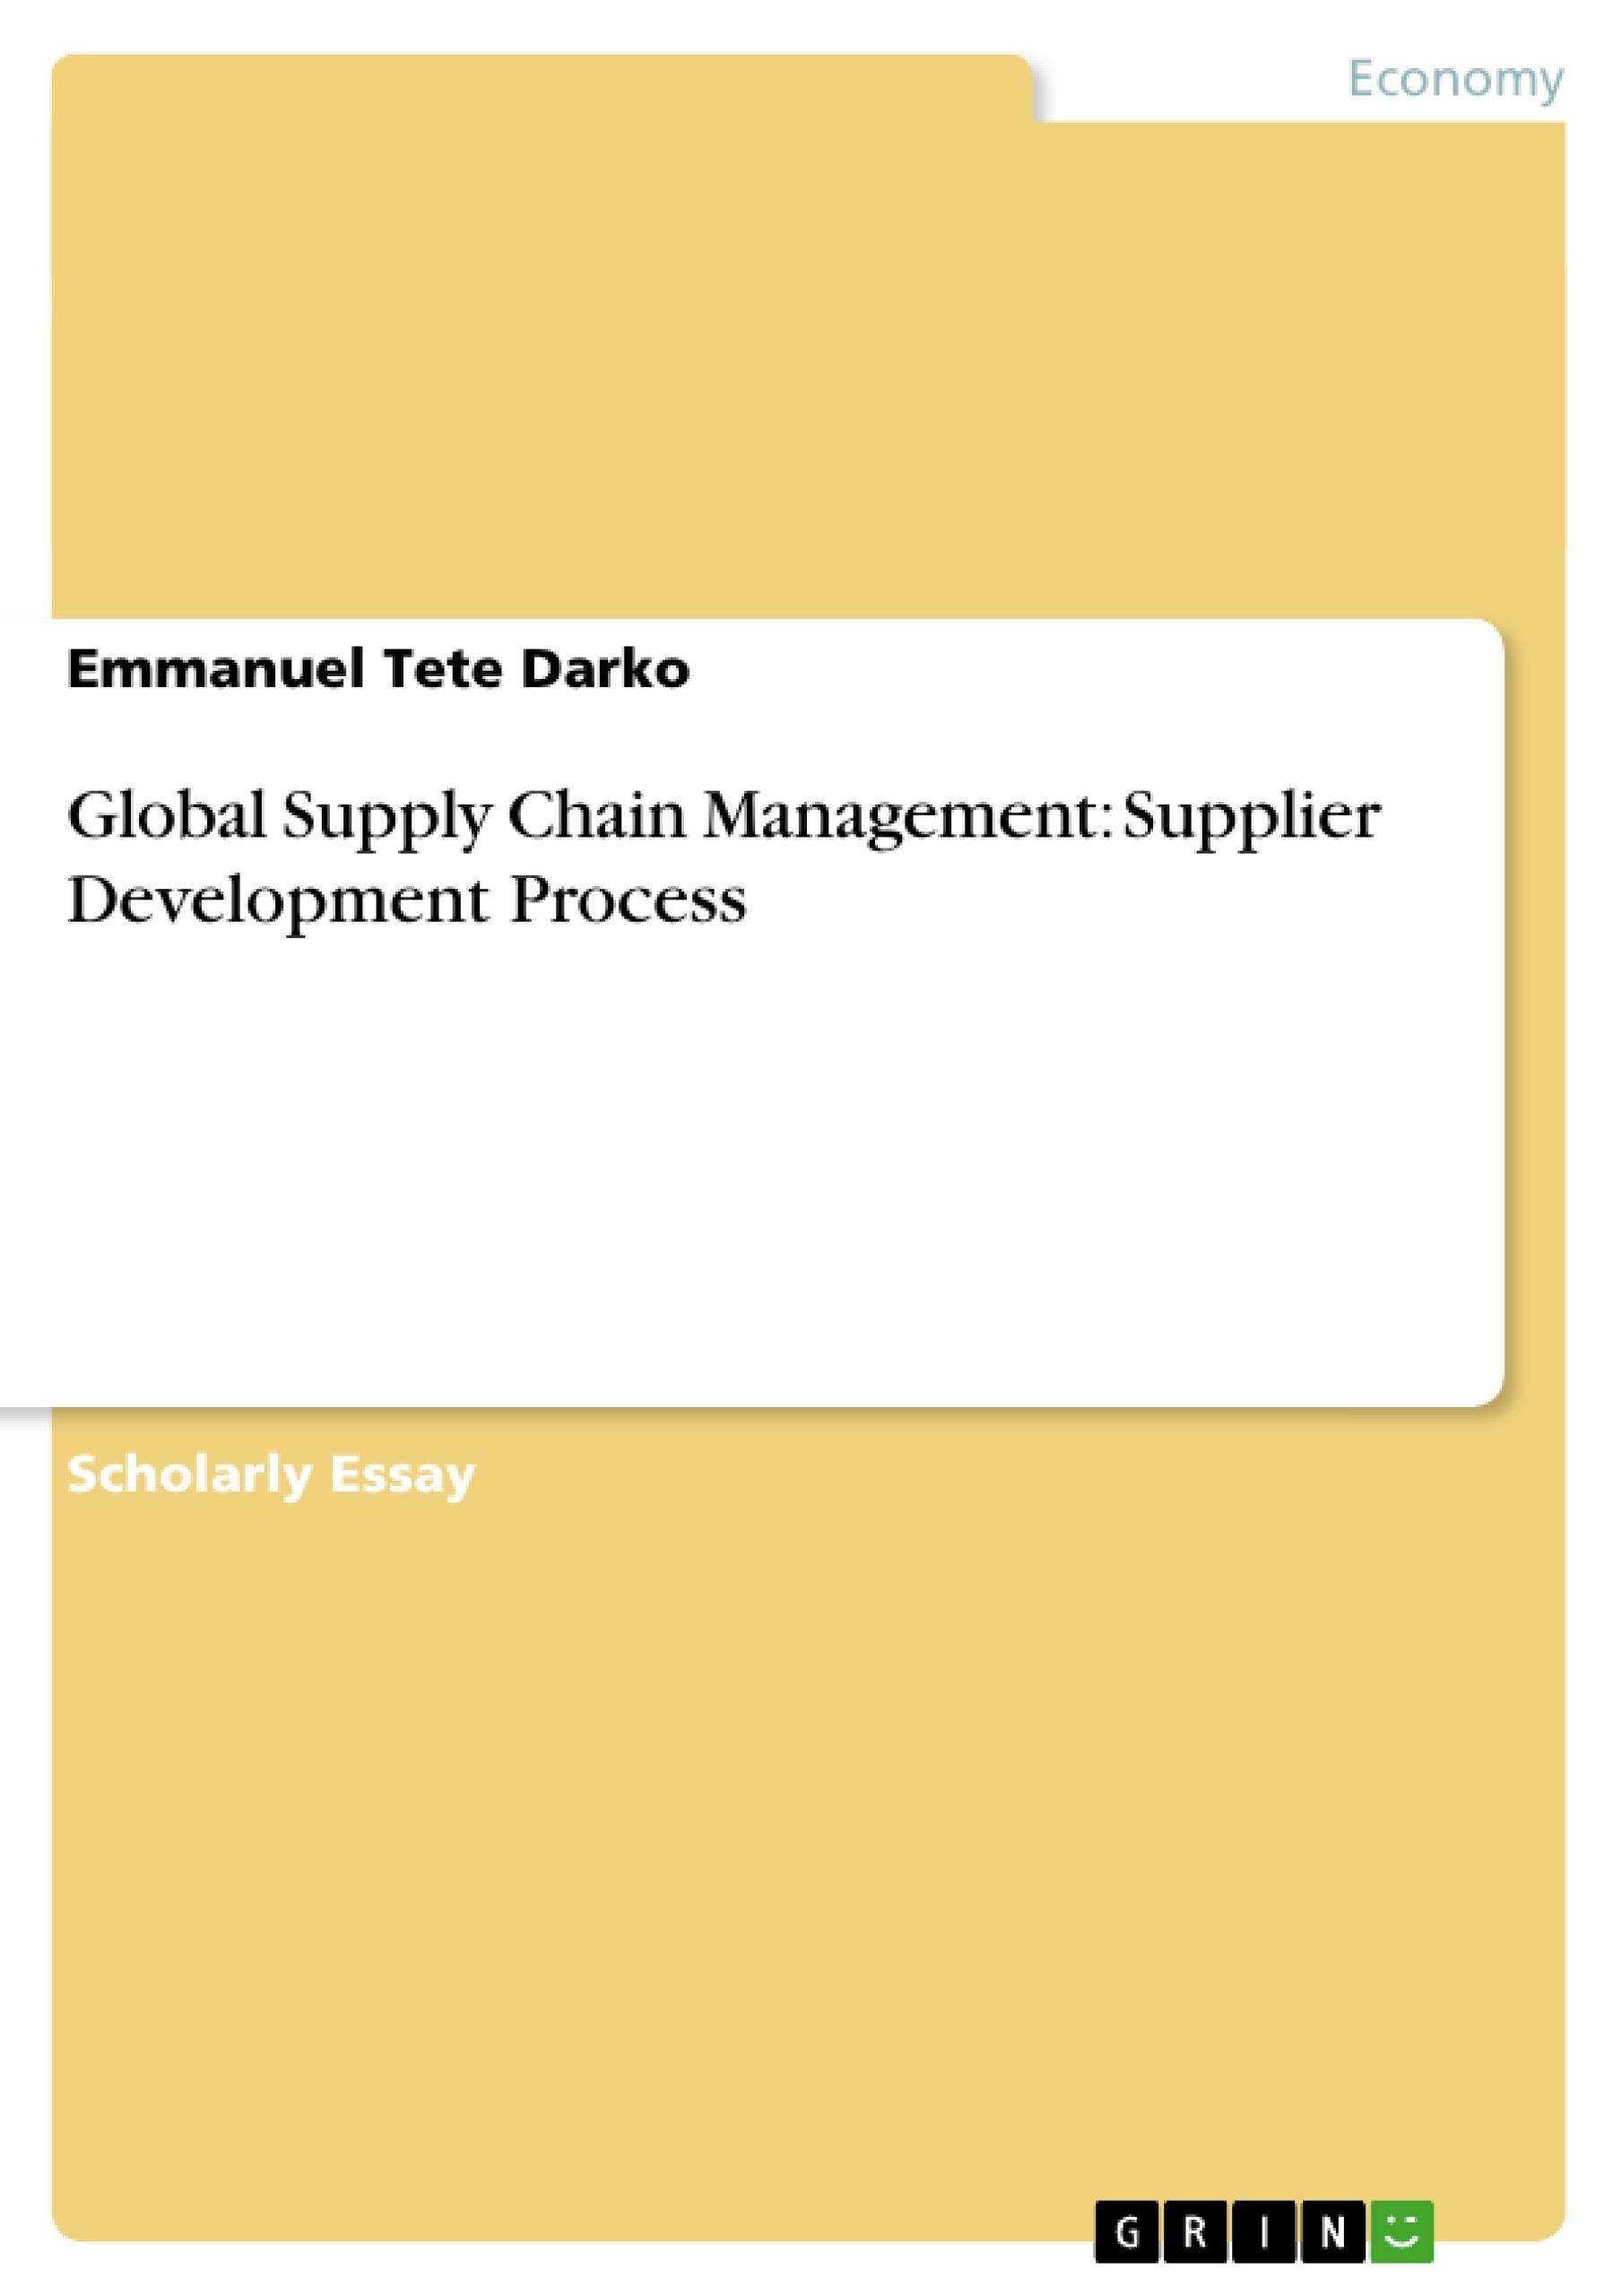 Title: Global Supply Chain Management: Supplier Development Process